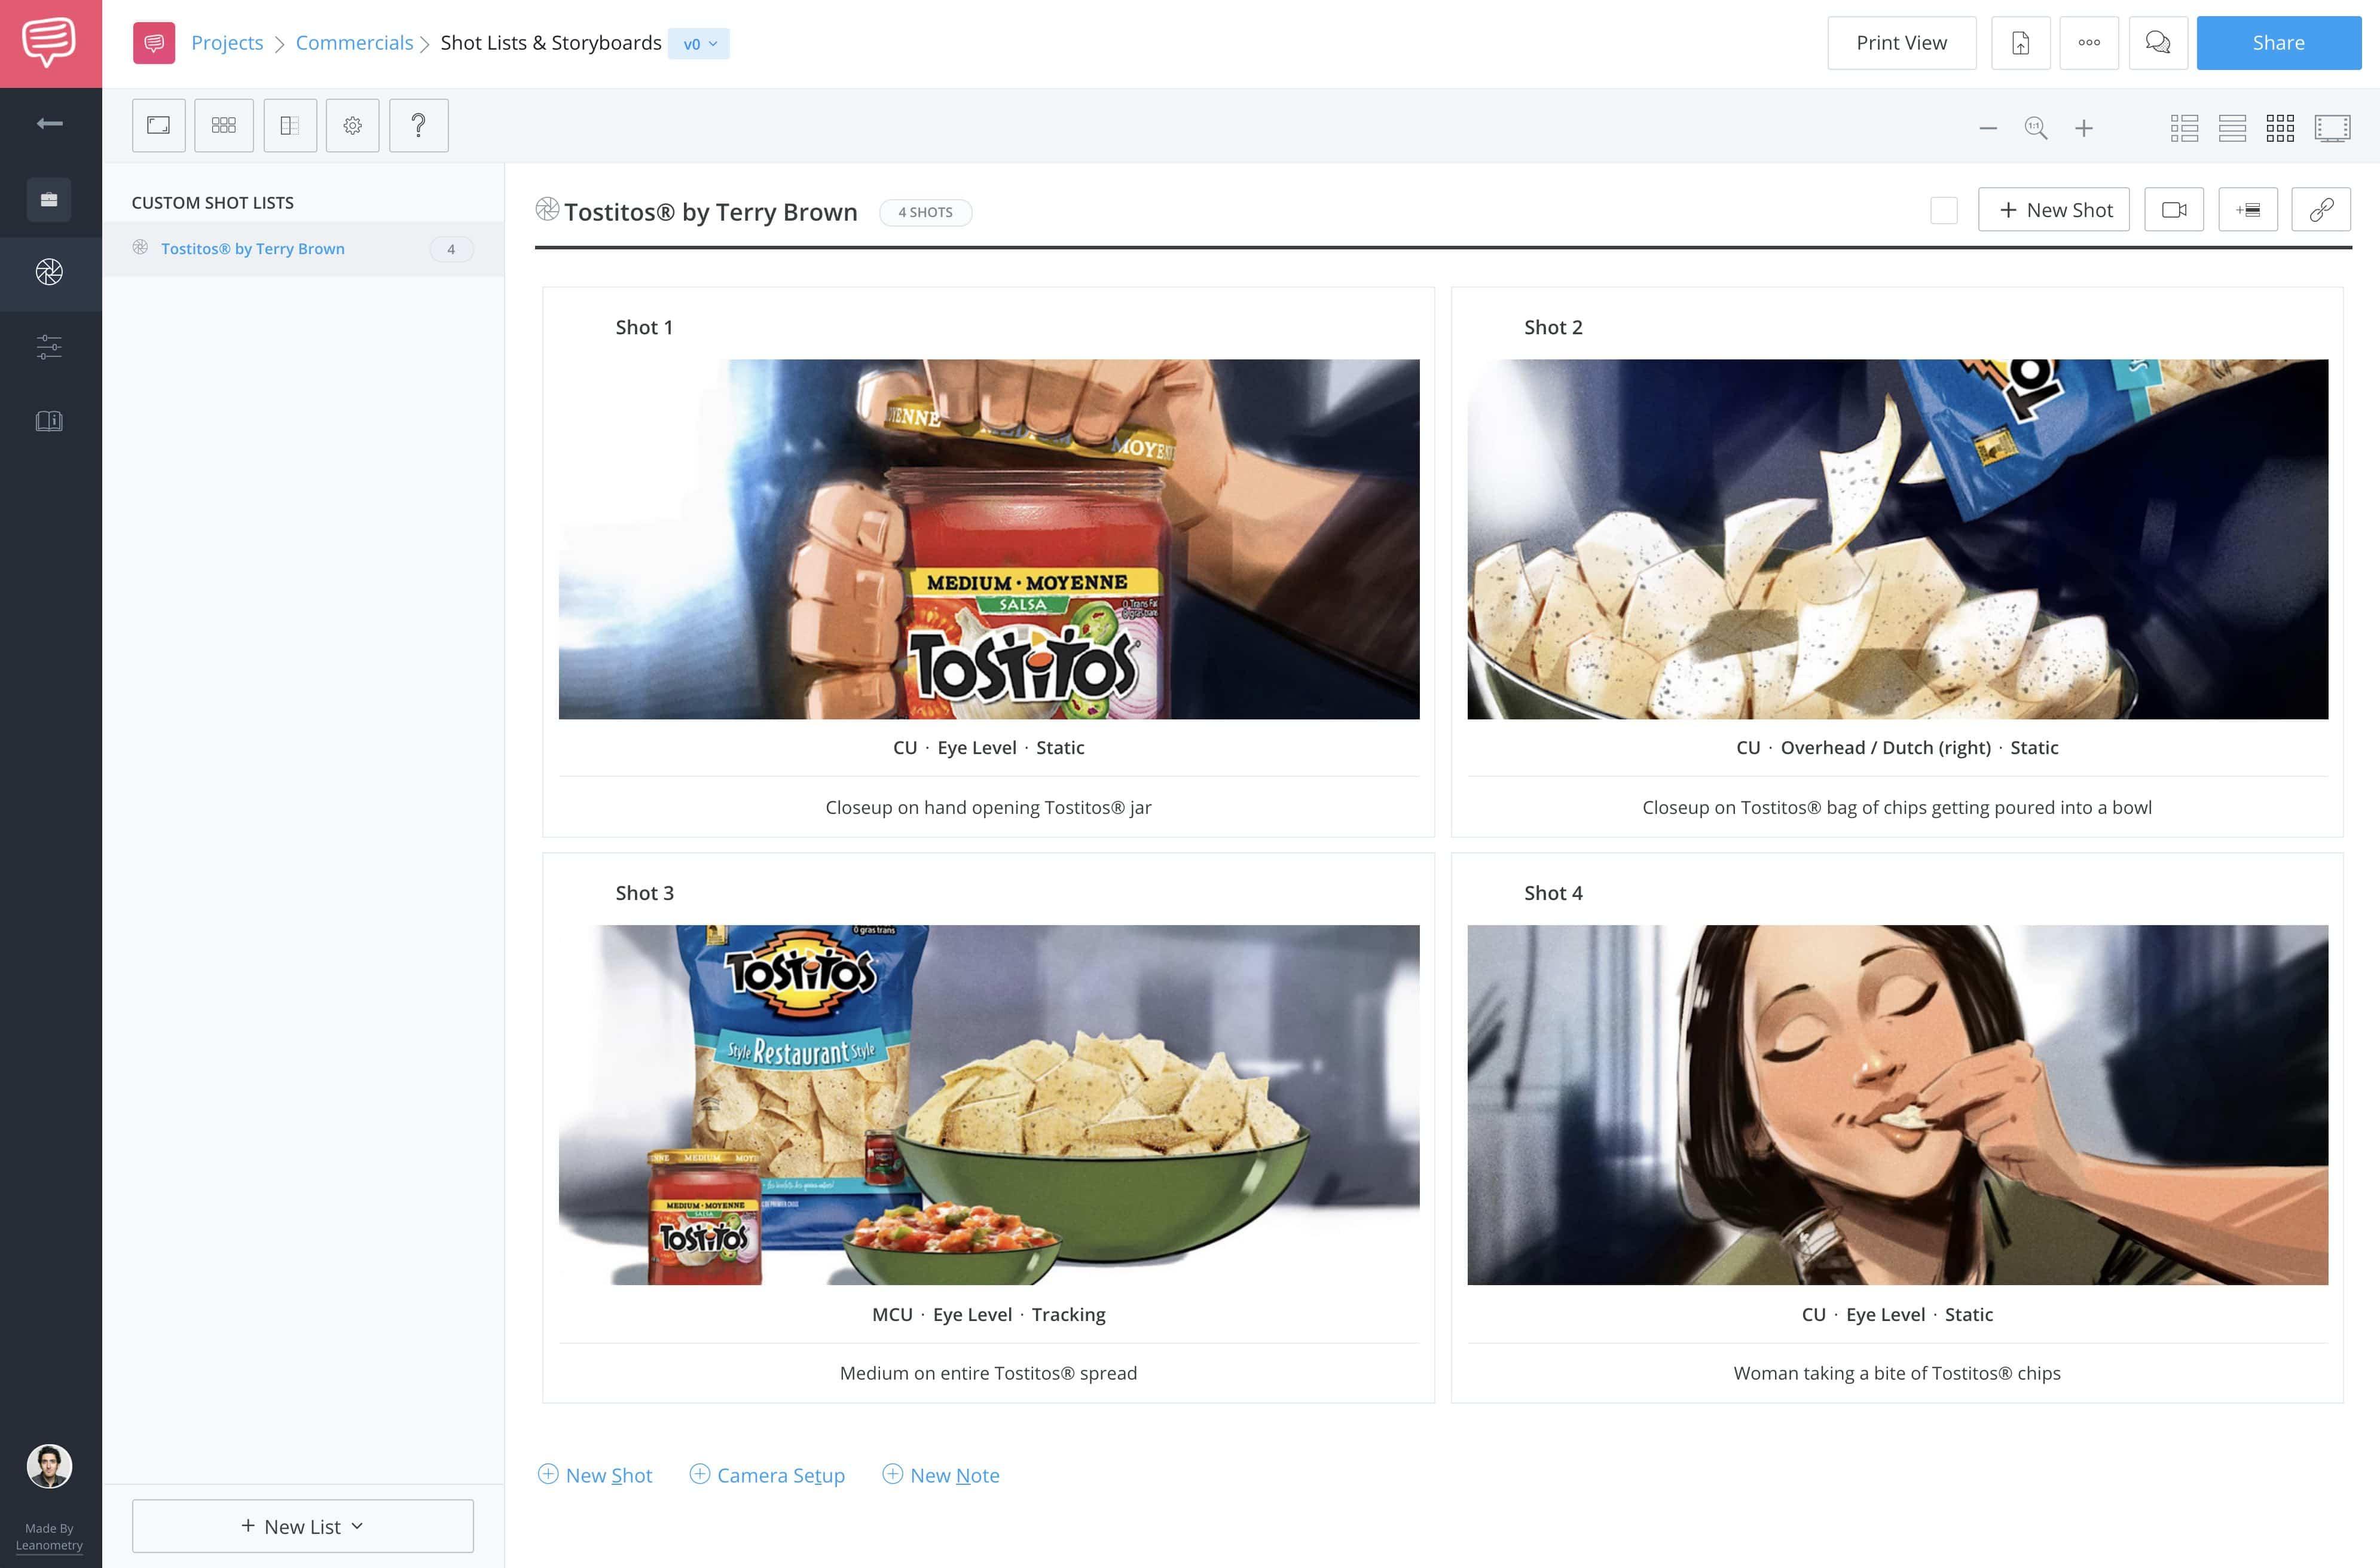 Storyboard Creator - Free TV Commercial Storyboard - StudioBinder Storyboard Maker